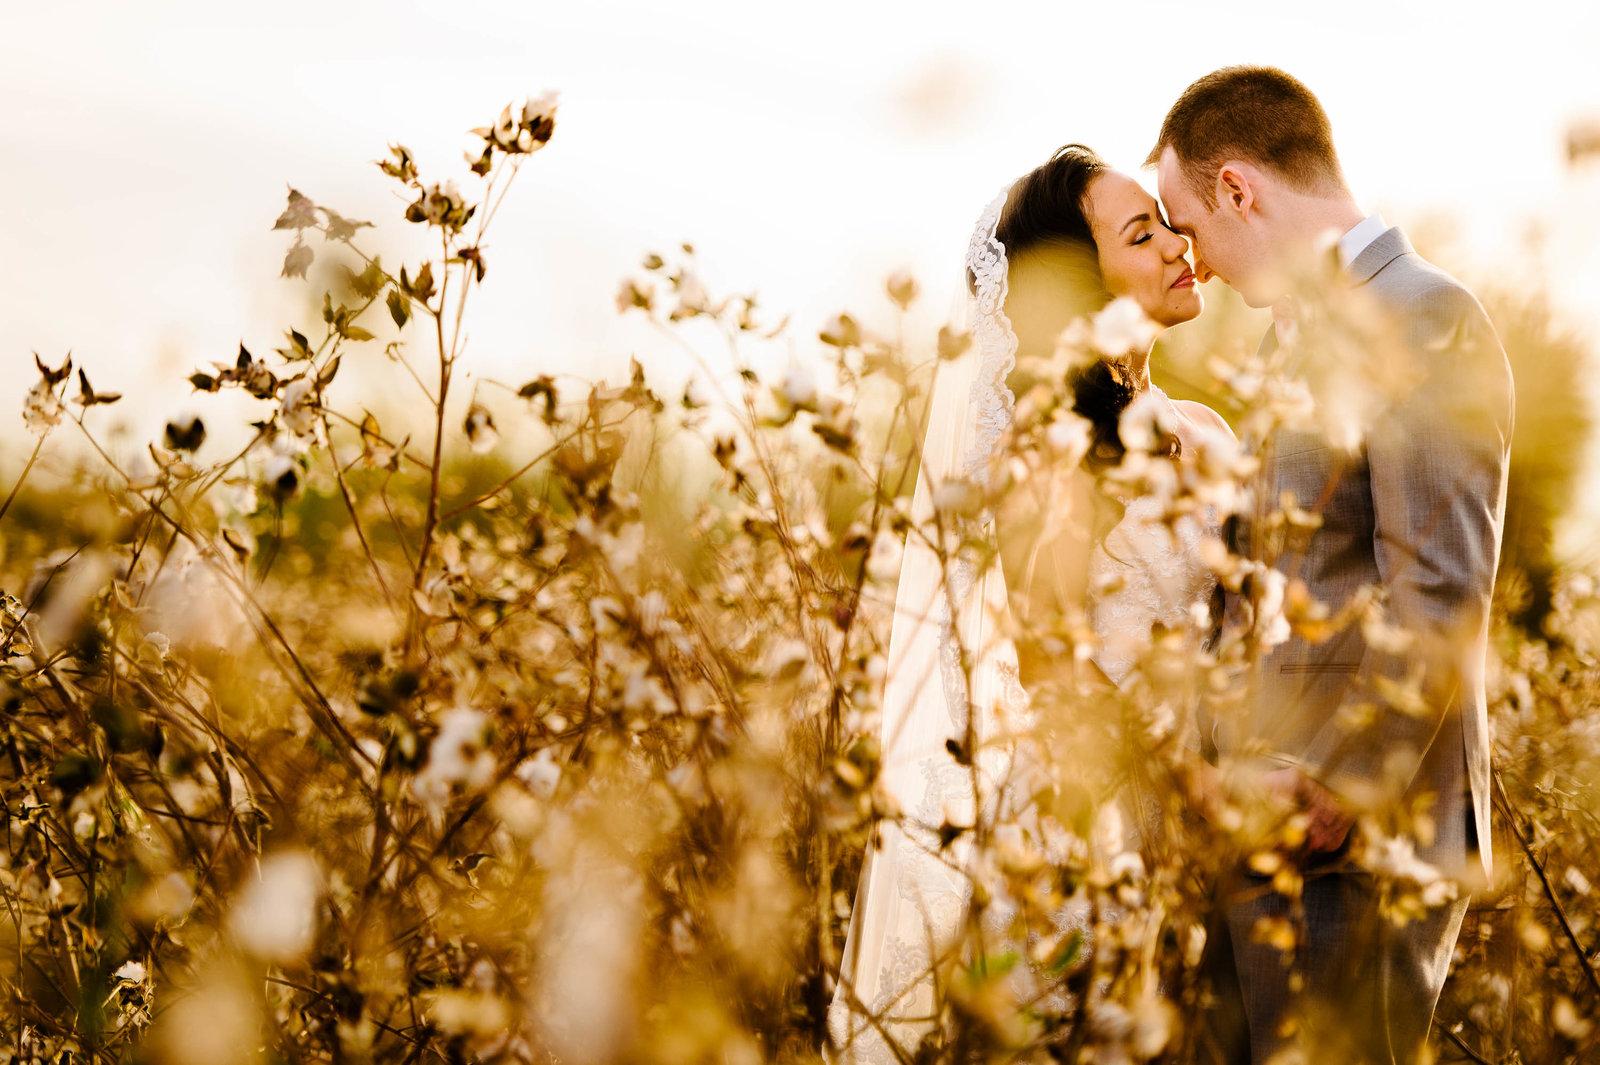 257-El-paso-wedding-photographer-JeMa_0434